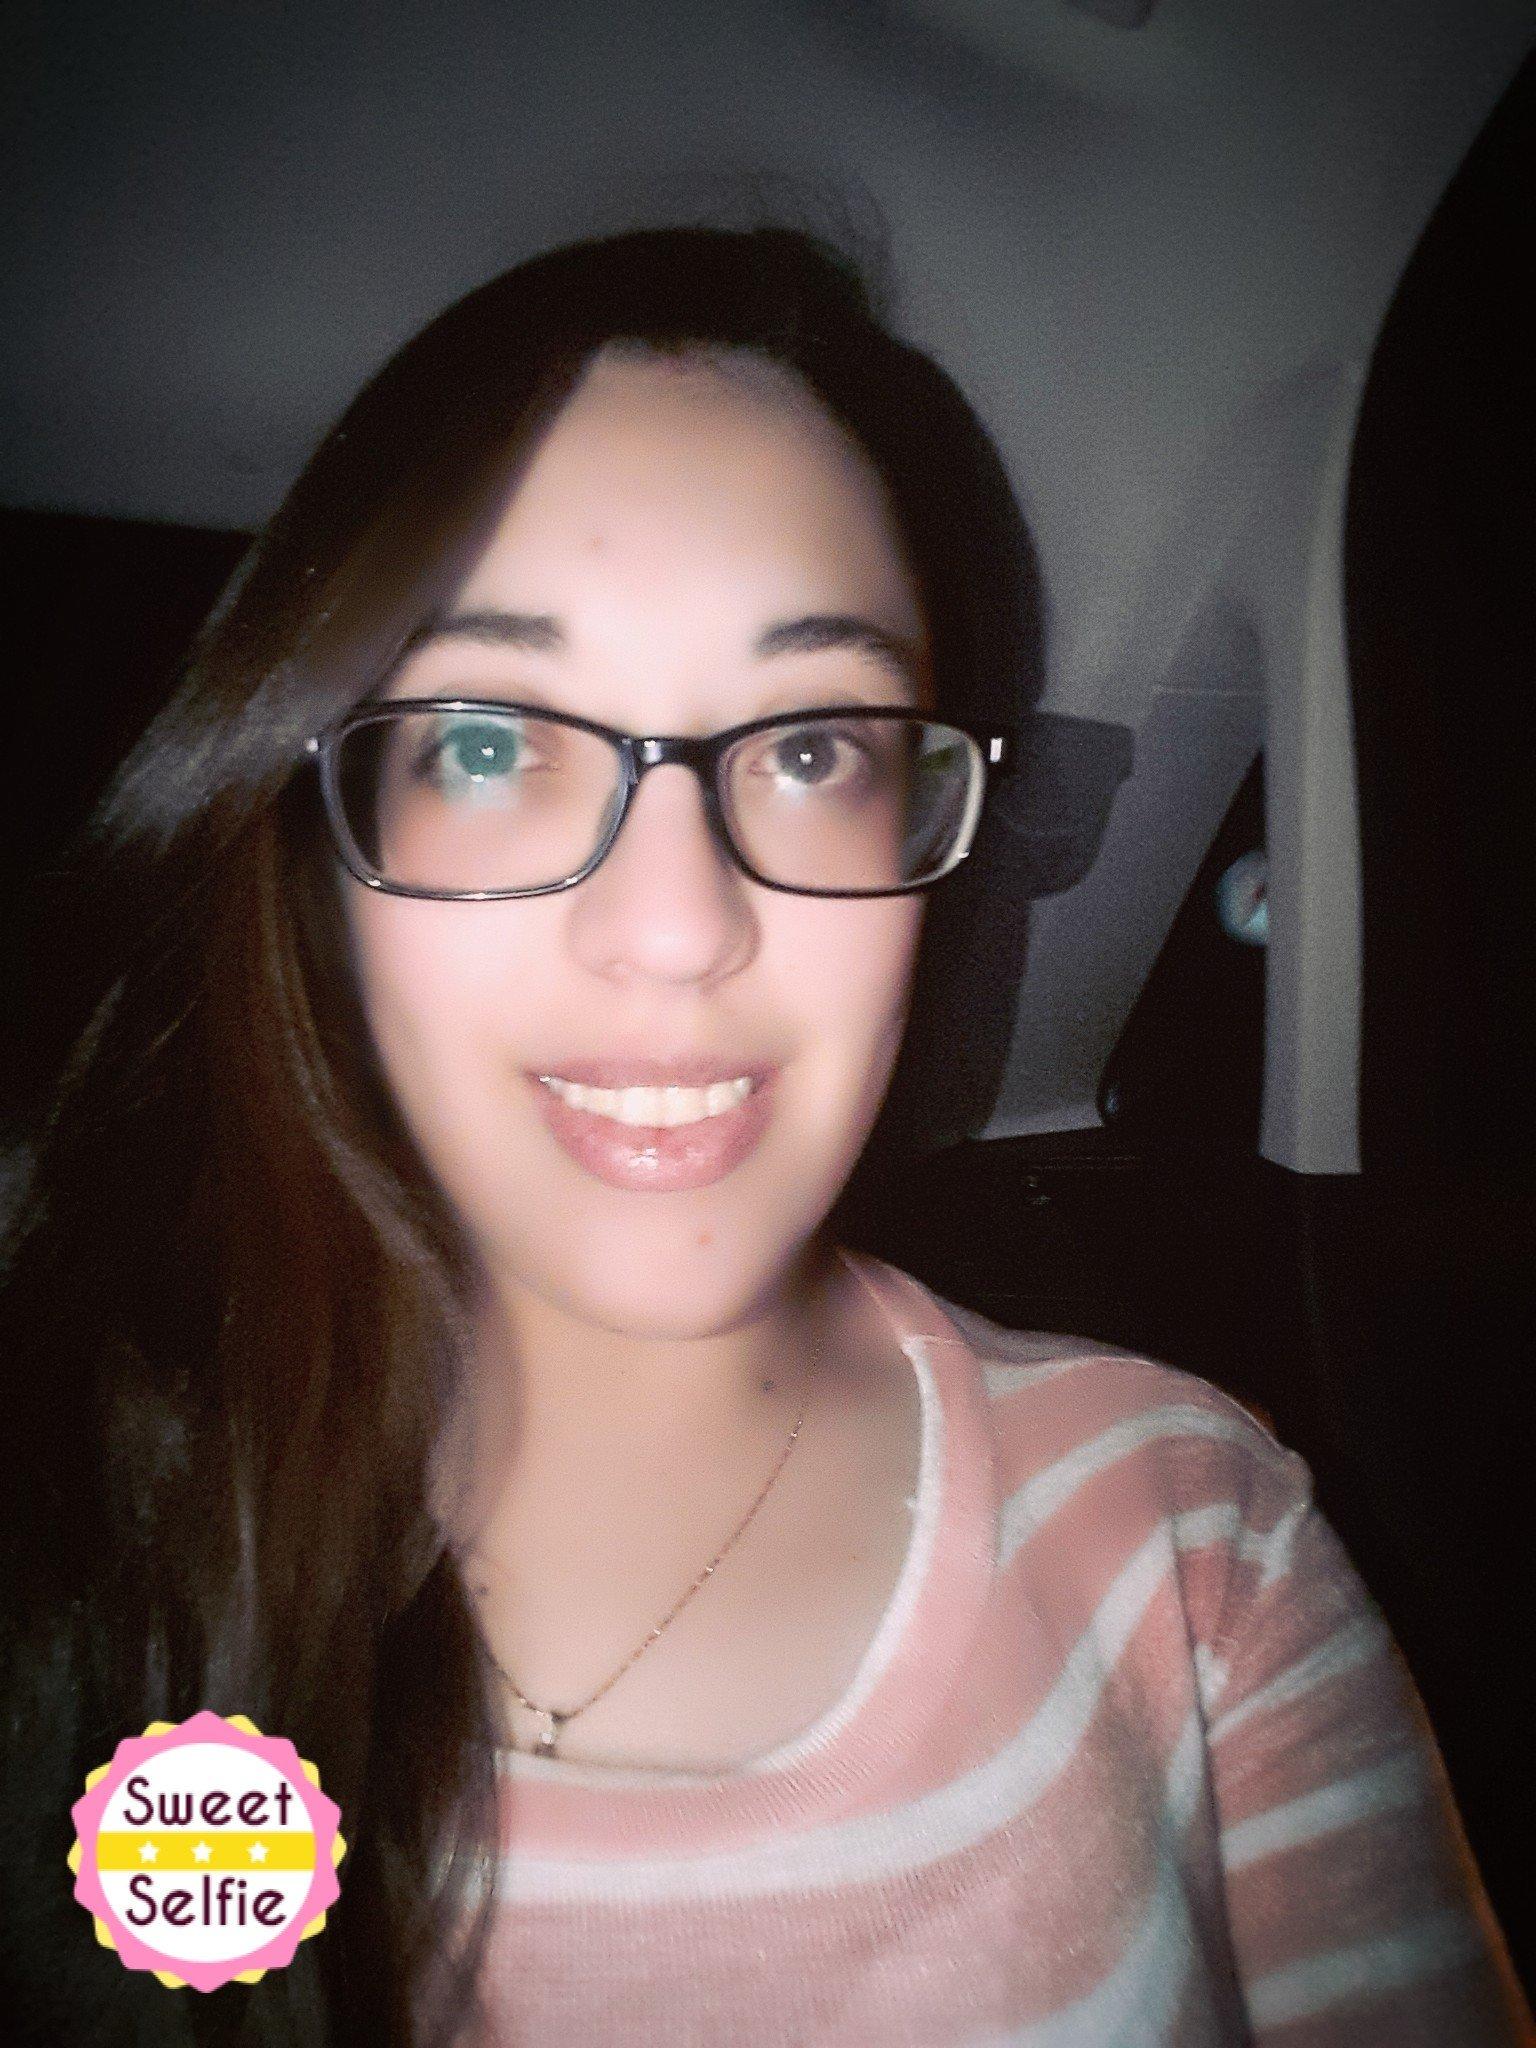 Selfie Evangelina Carrozzo naked (41 photo), Sexy, Paparazzi, Selfie, cameltoe 2017